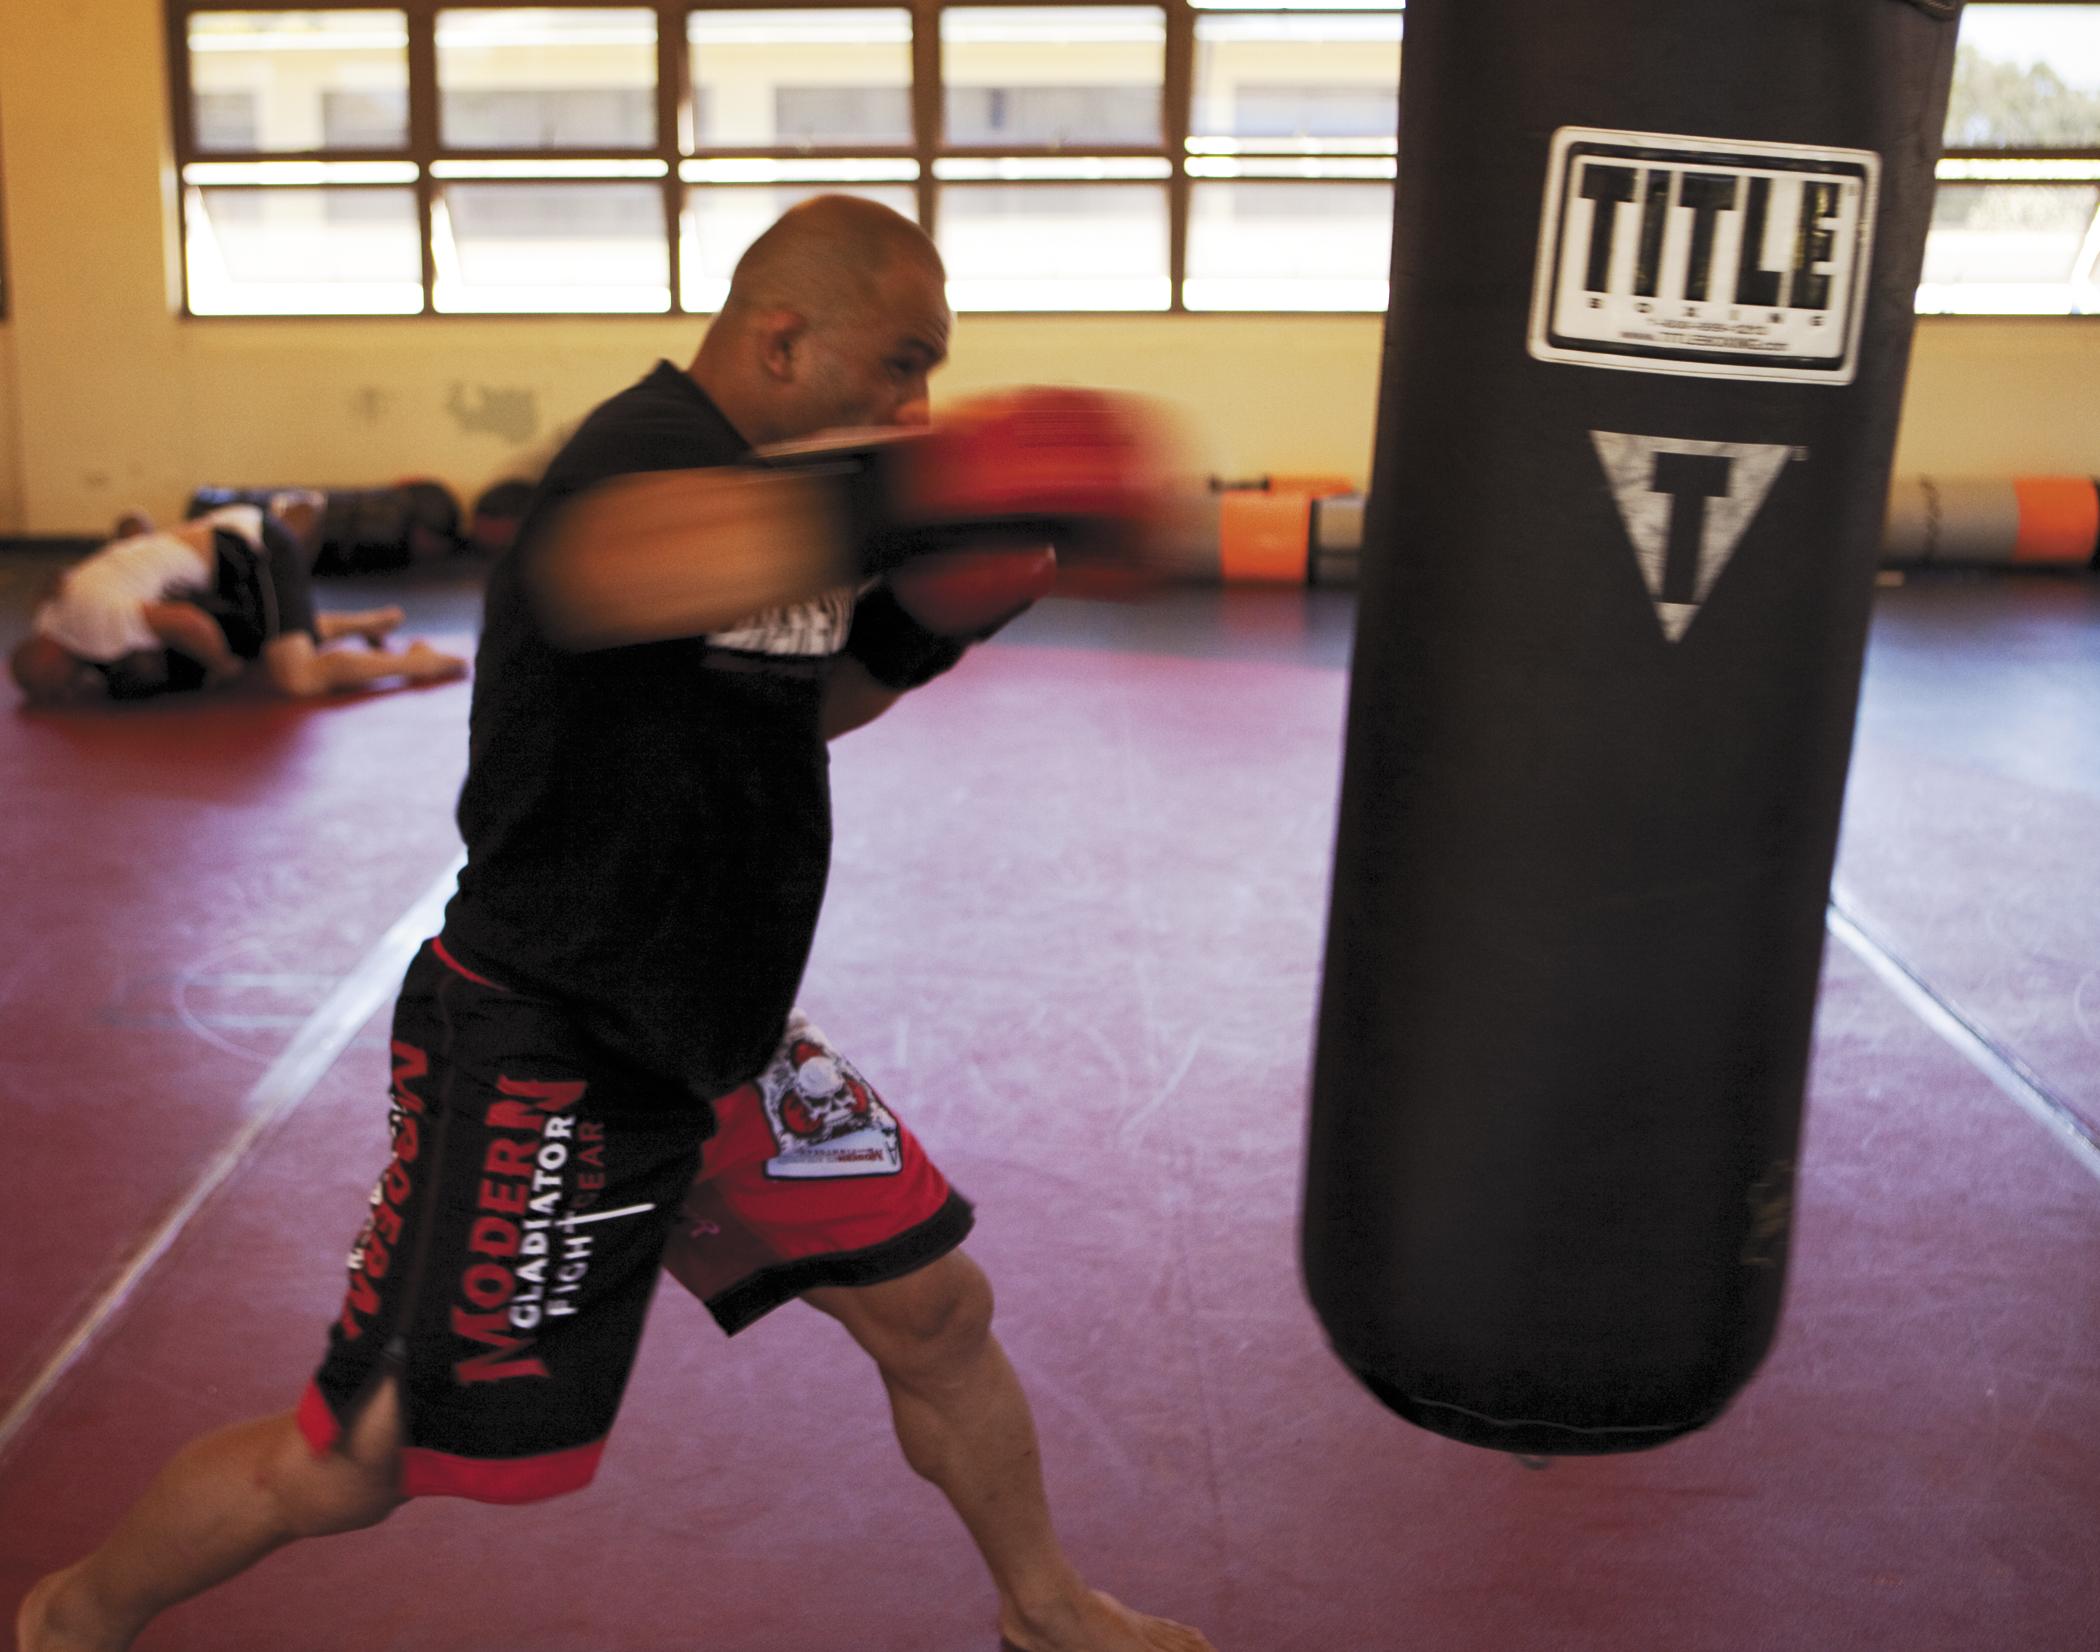 Punching bag - Wikipedia